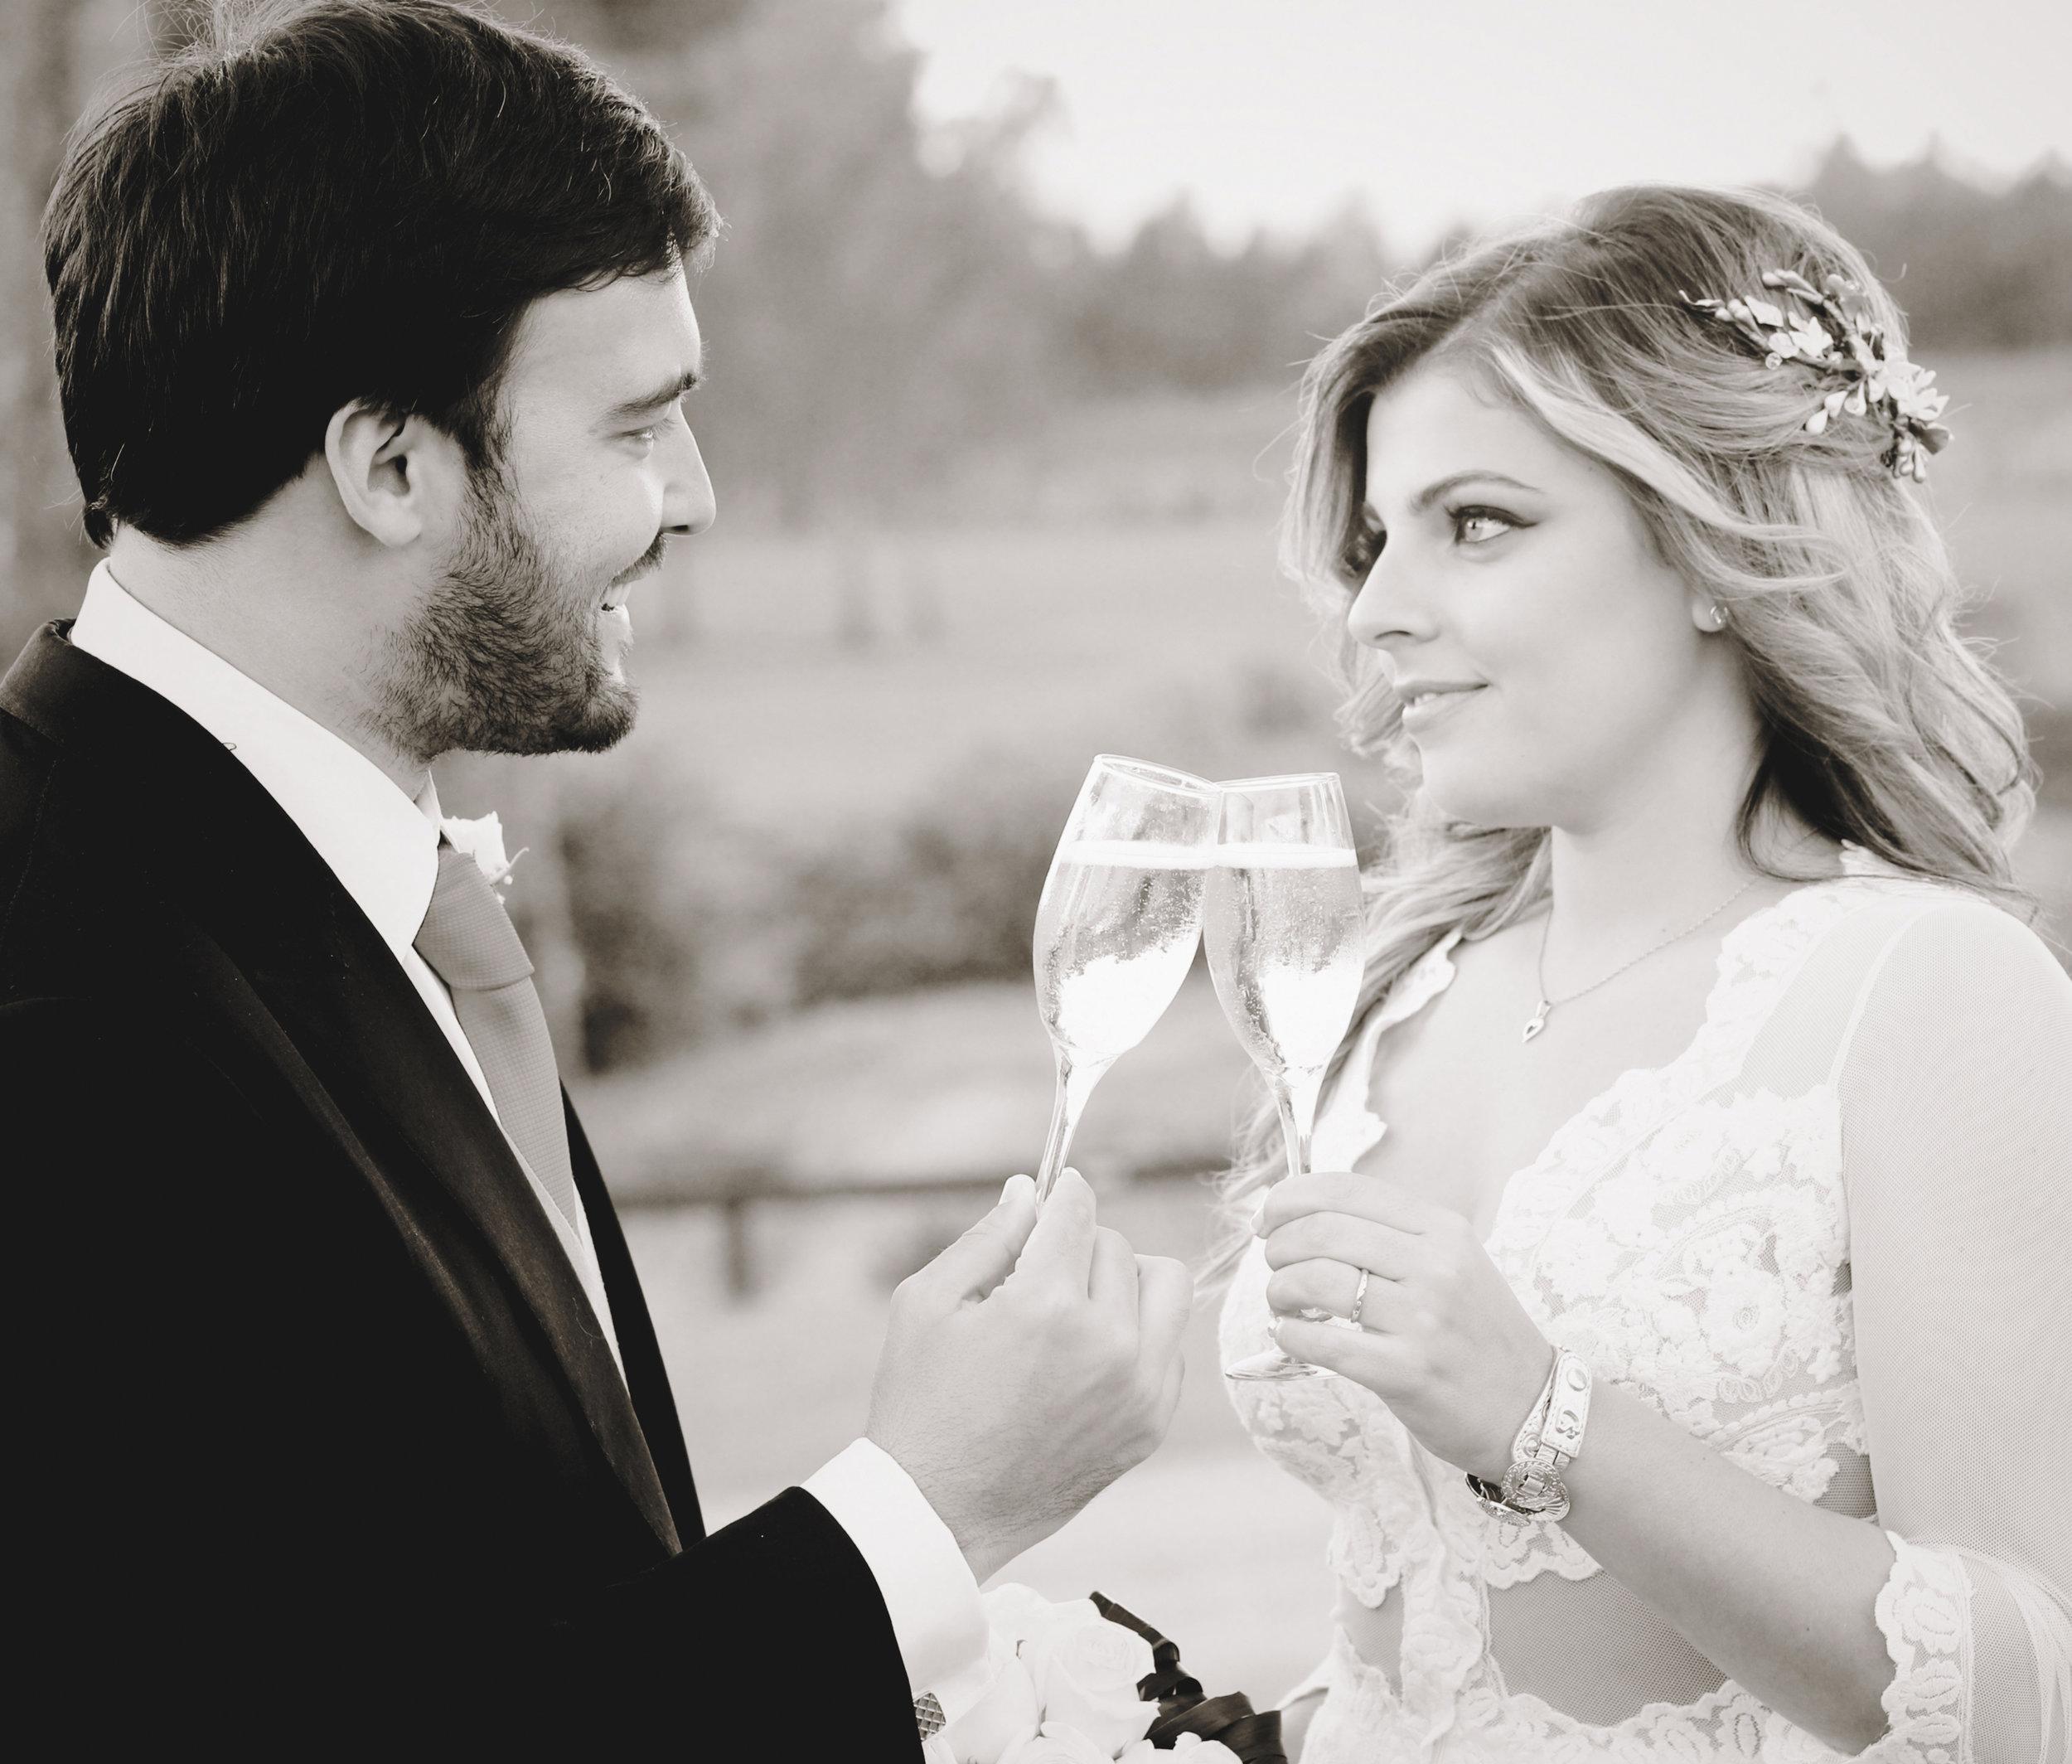 27-Fotografía-Bodas-Casamiento-Eventos-Fiesta-Diego-Piuma.jpg